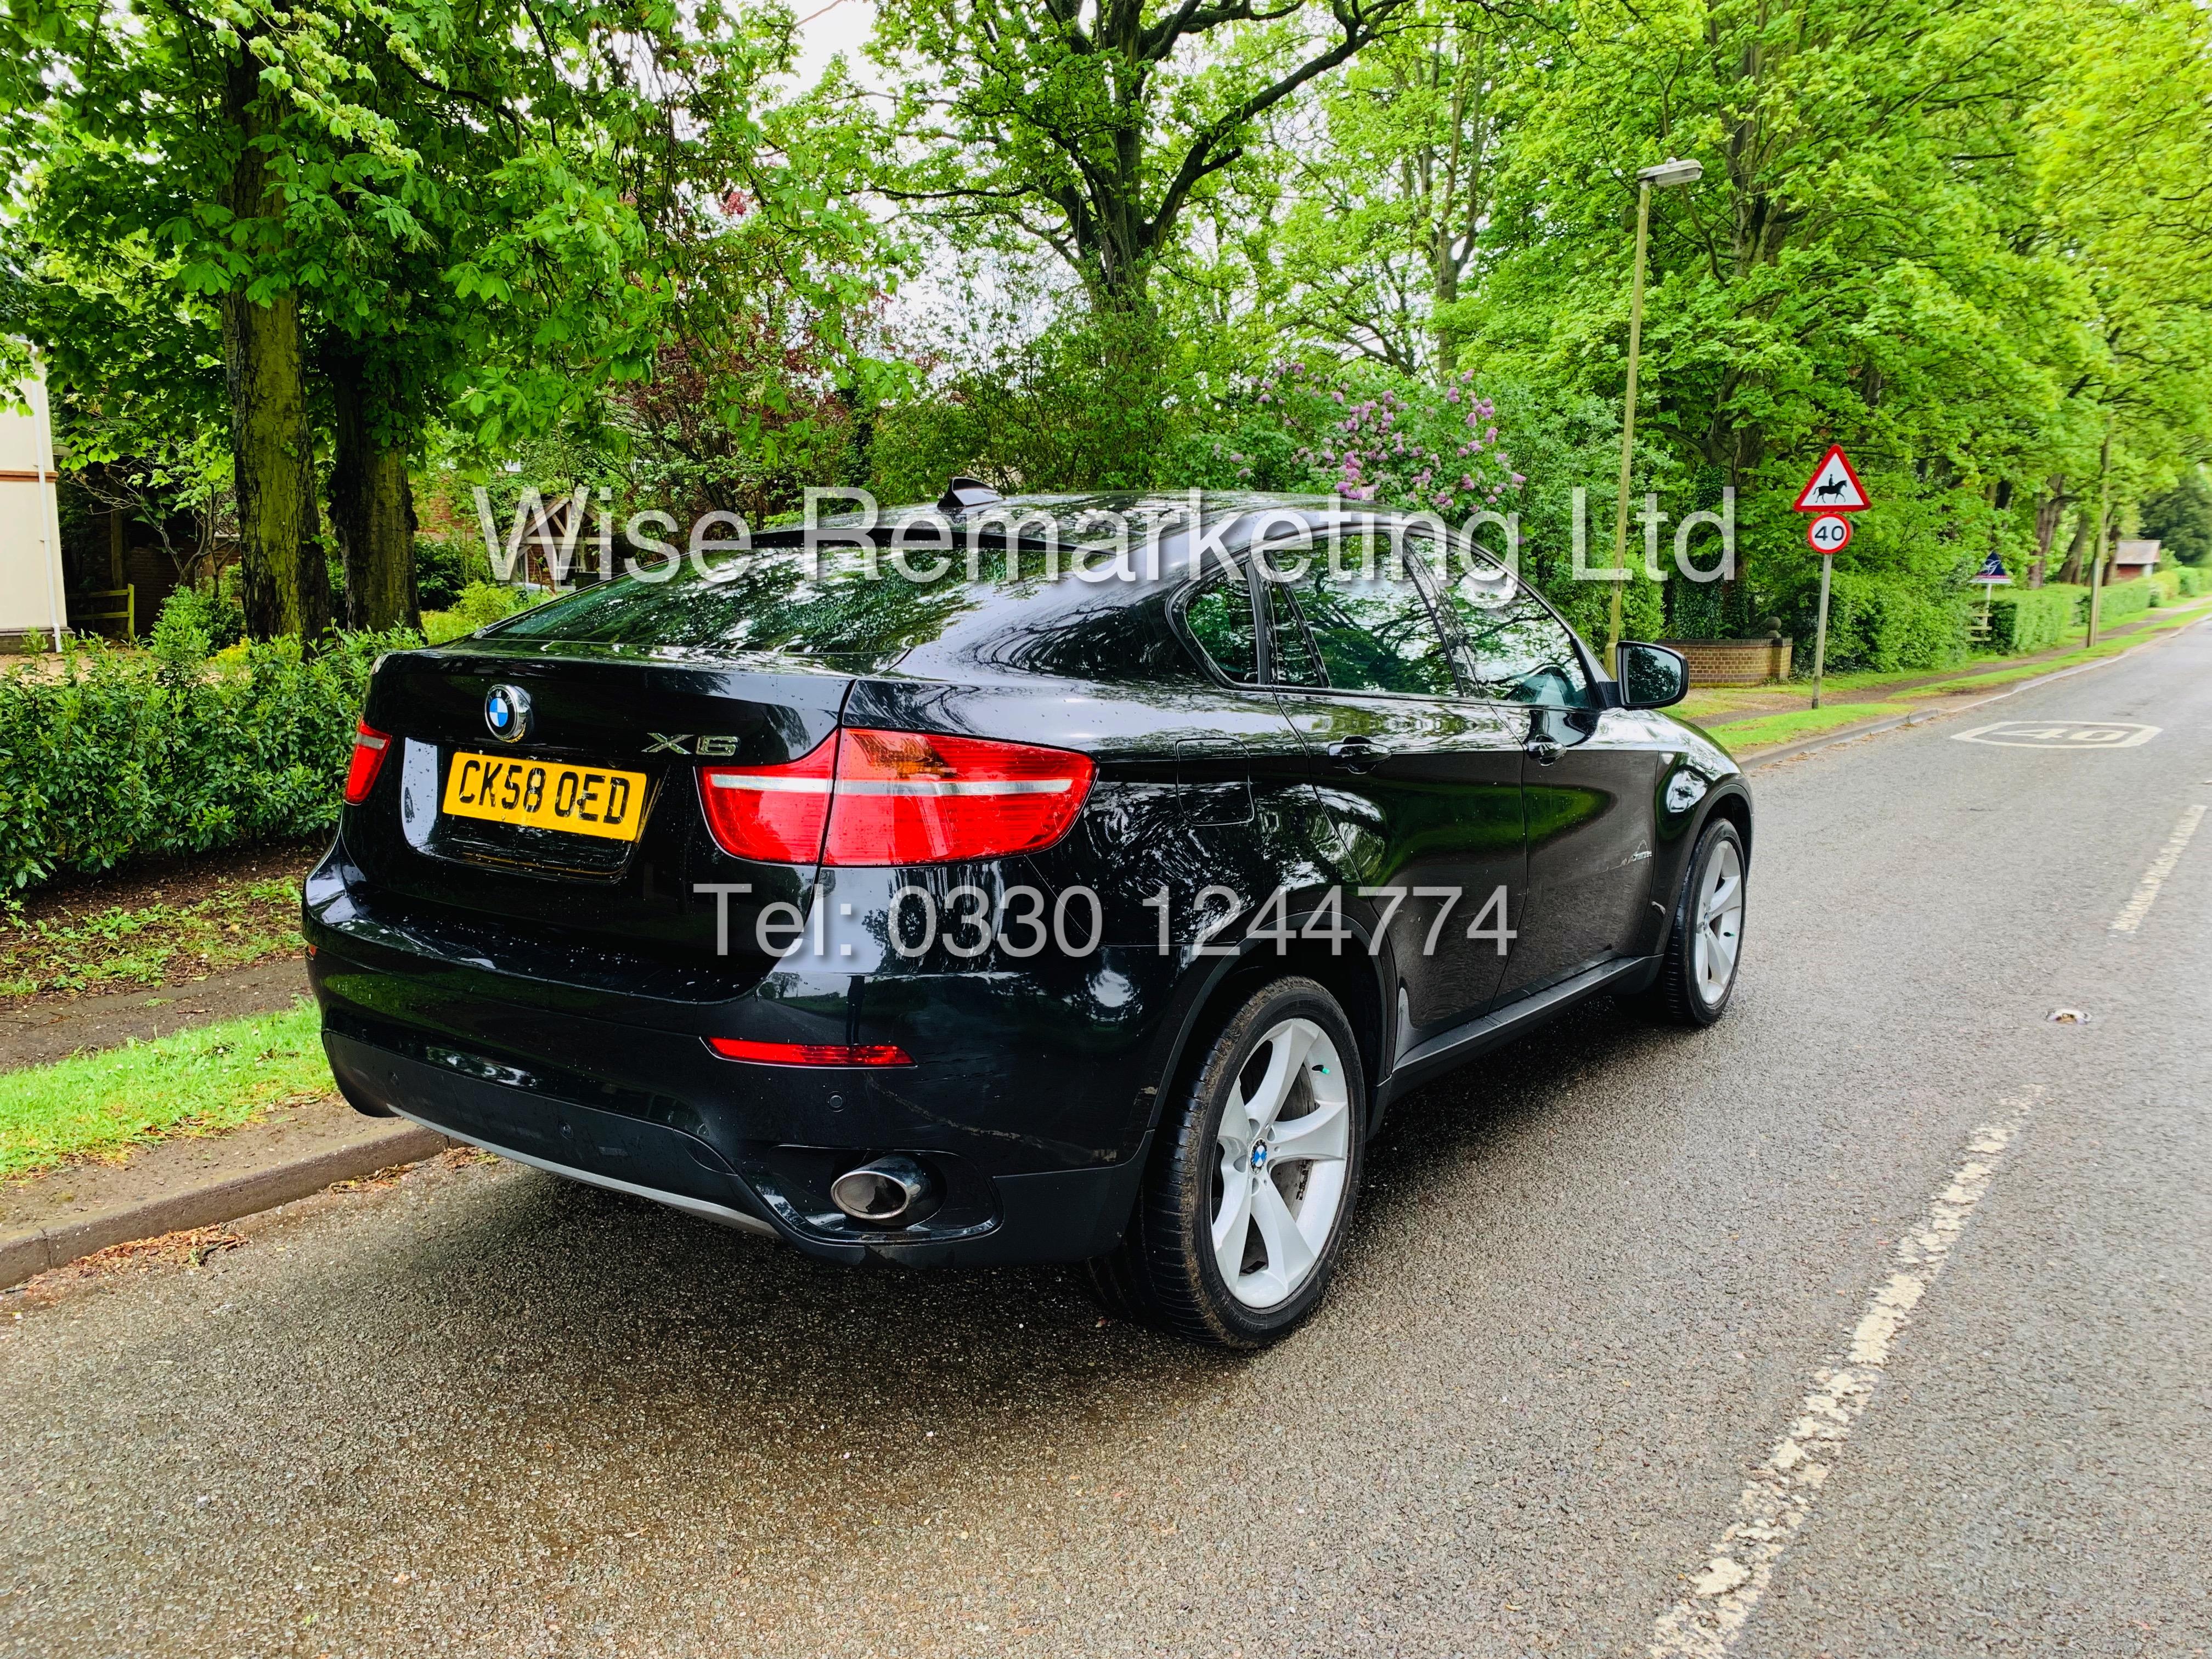 BMW X6 XDRIVE 35D AUTO (2009 SPEC) *1 PREVIOUS OWNER* PARKING AID - SAT NAV - FSH - Image 5 of 25